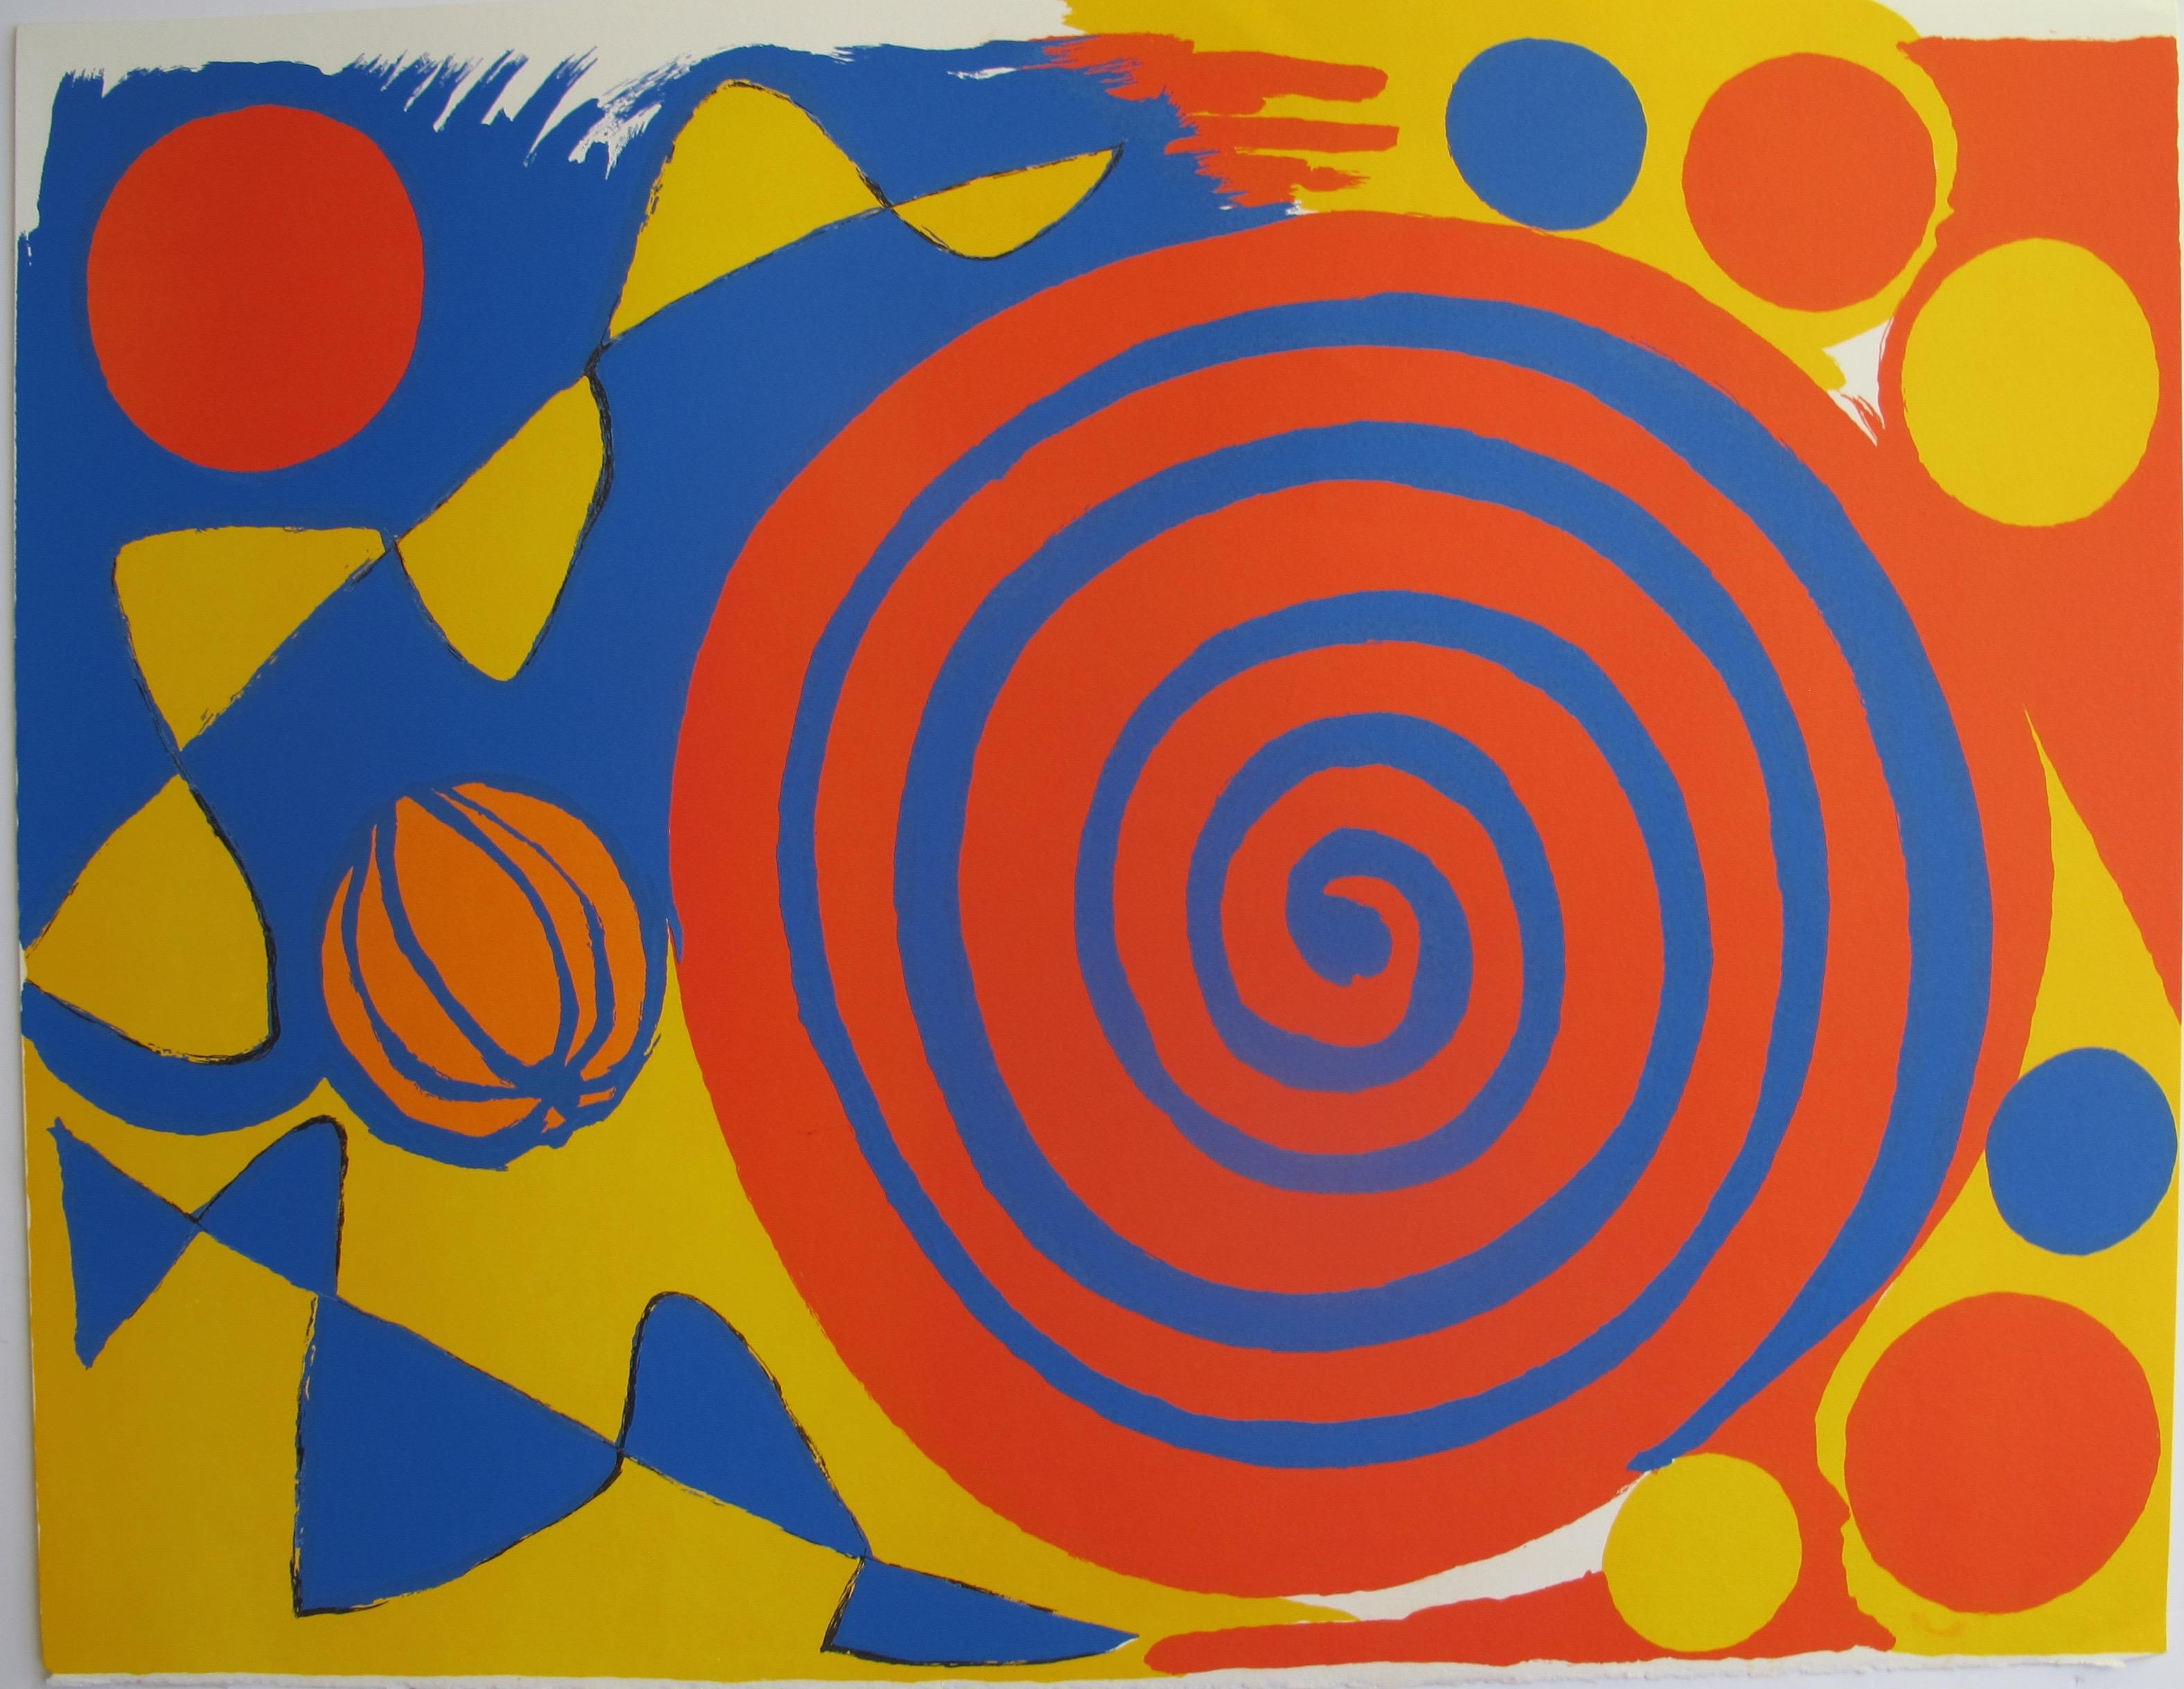 Alexander Calder SPIRALE AVEC CITROUILLE 1973 Lithograph